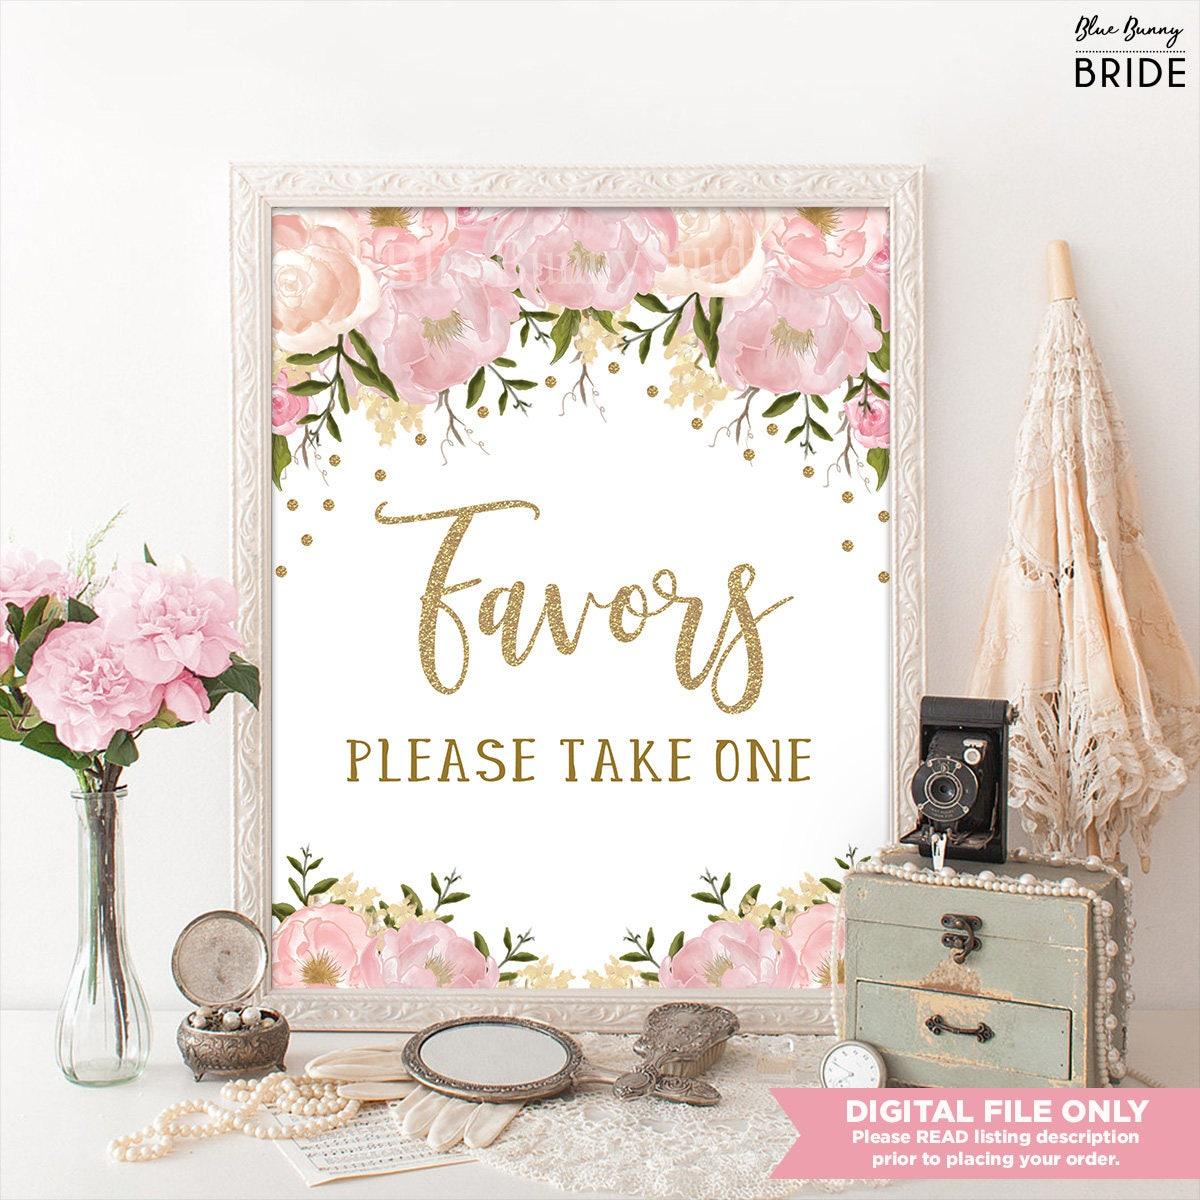 Pink and Gold Floral Bridal Shower Favors Printable Sign.